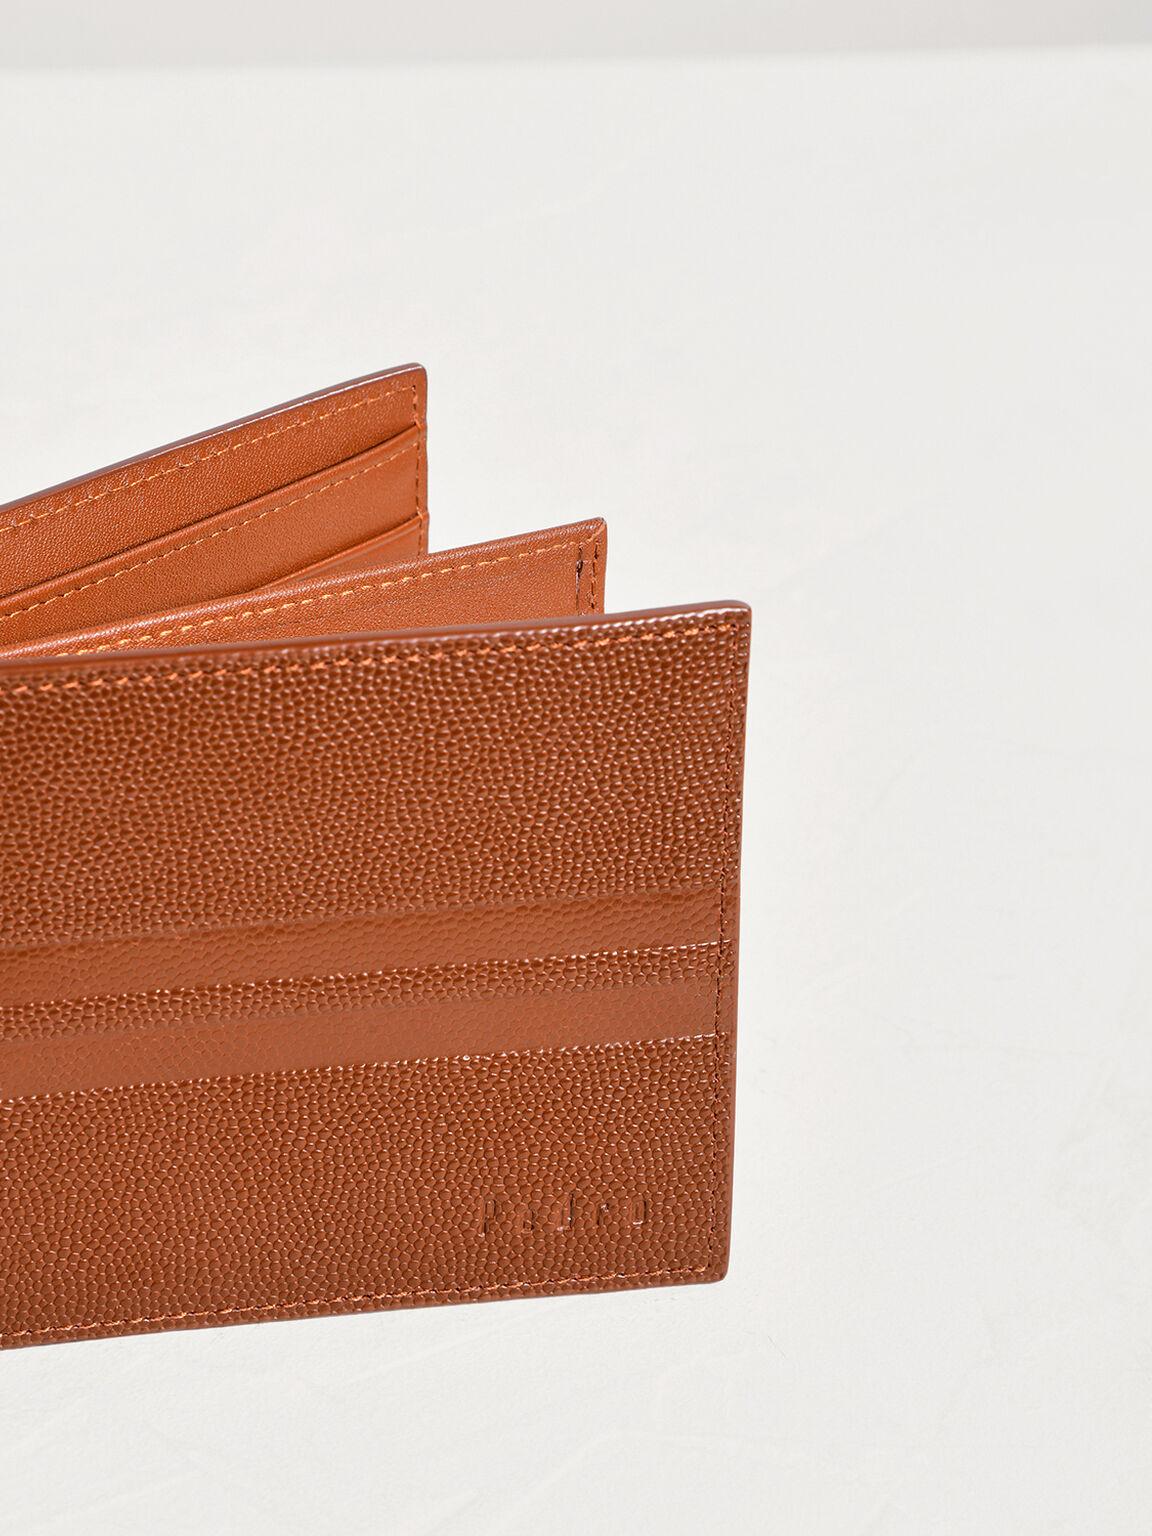 Striped Leather Bi-Fold Flip Wallet, Cognac, hi-res